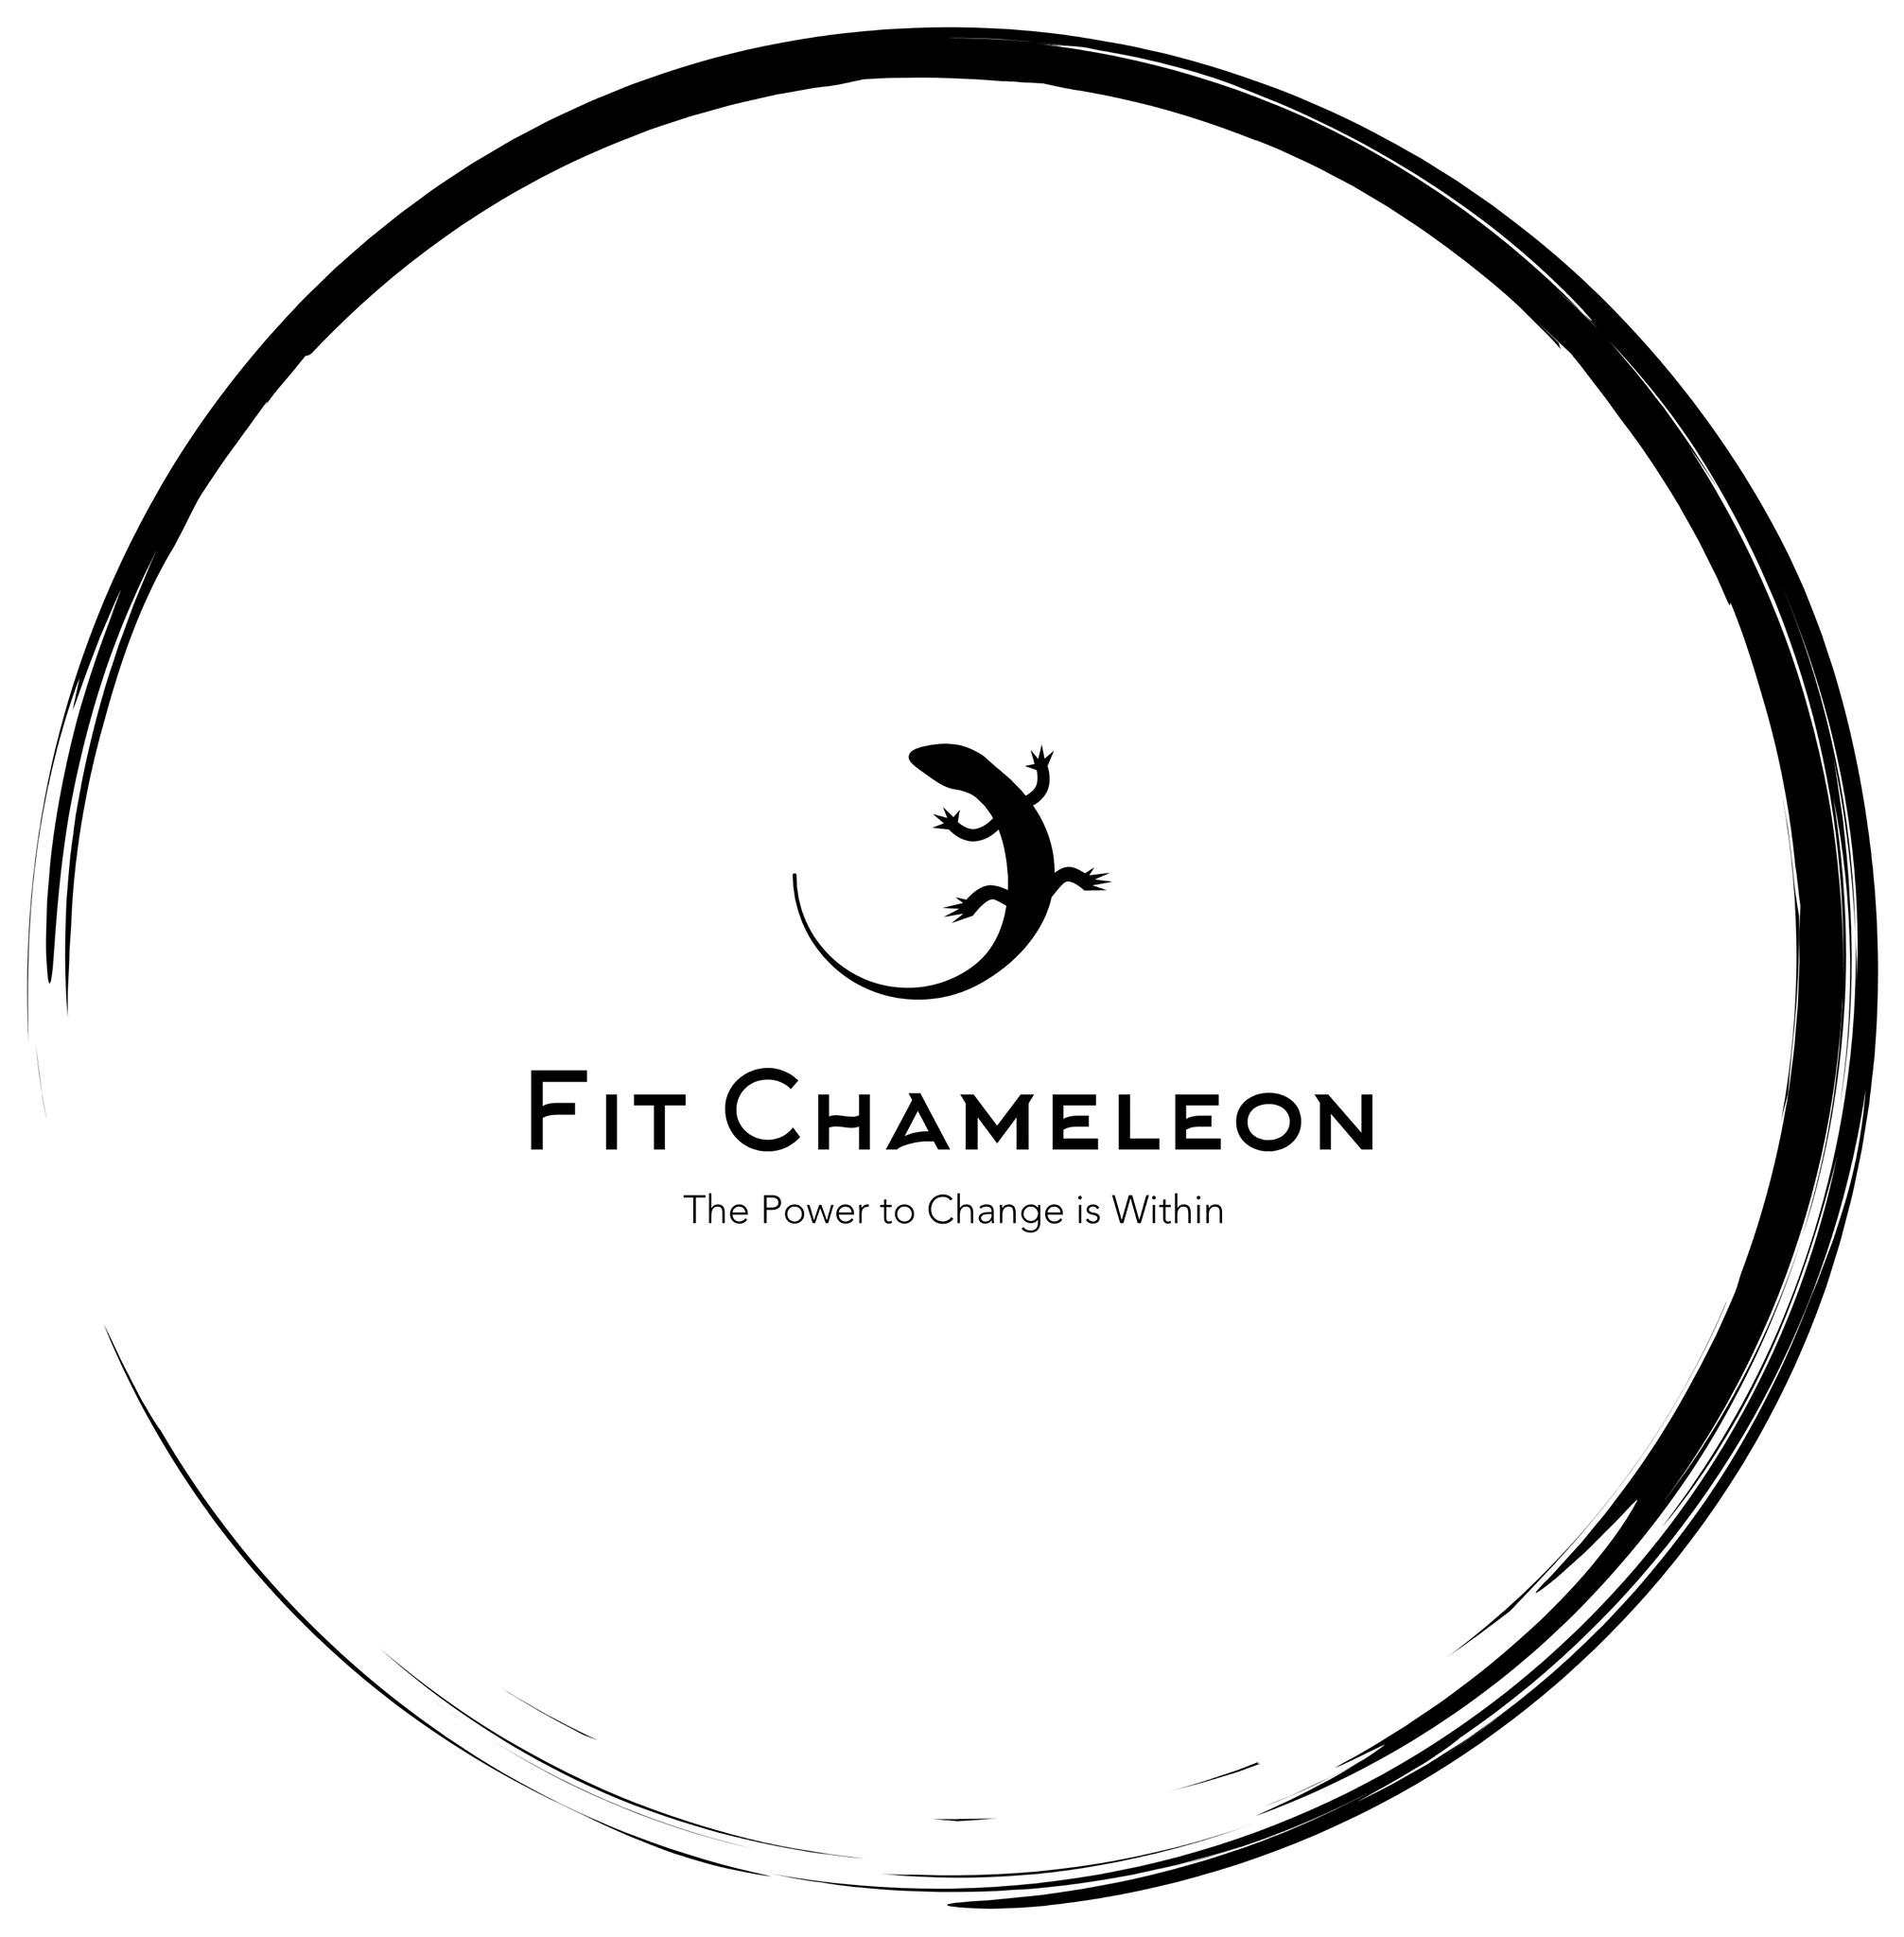 fit chameleon, personal trainer, fitness blog